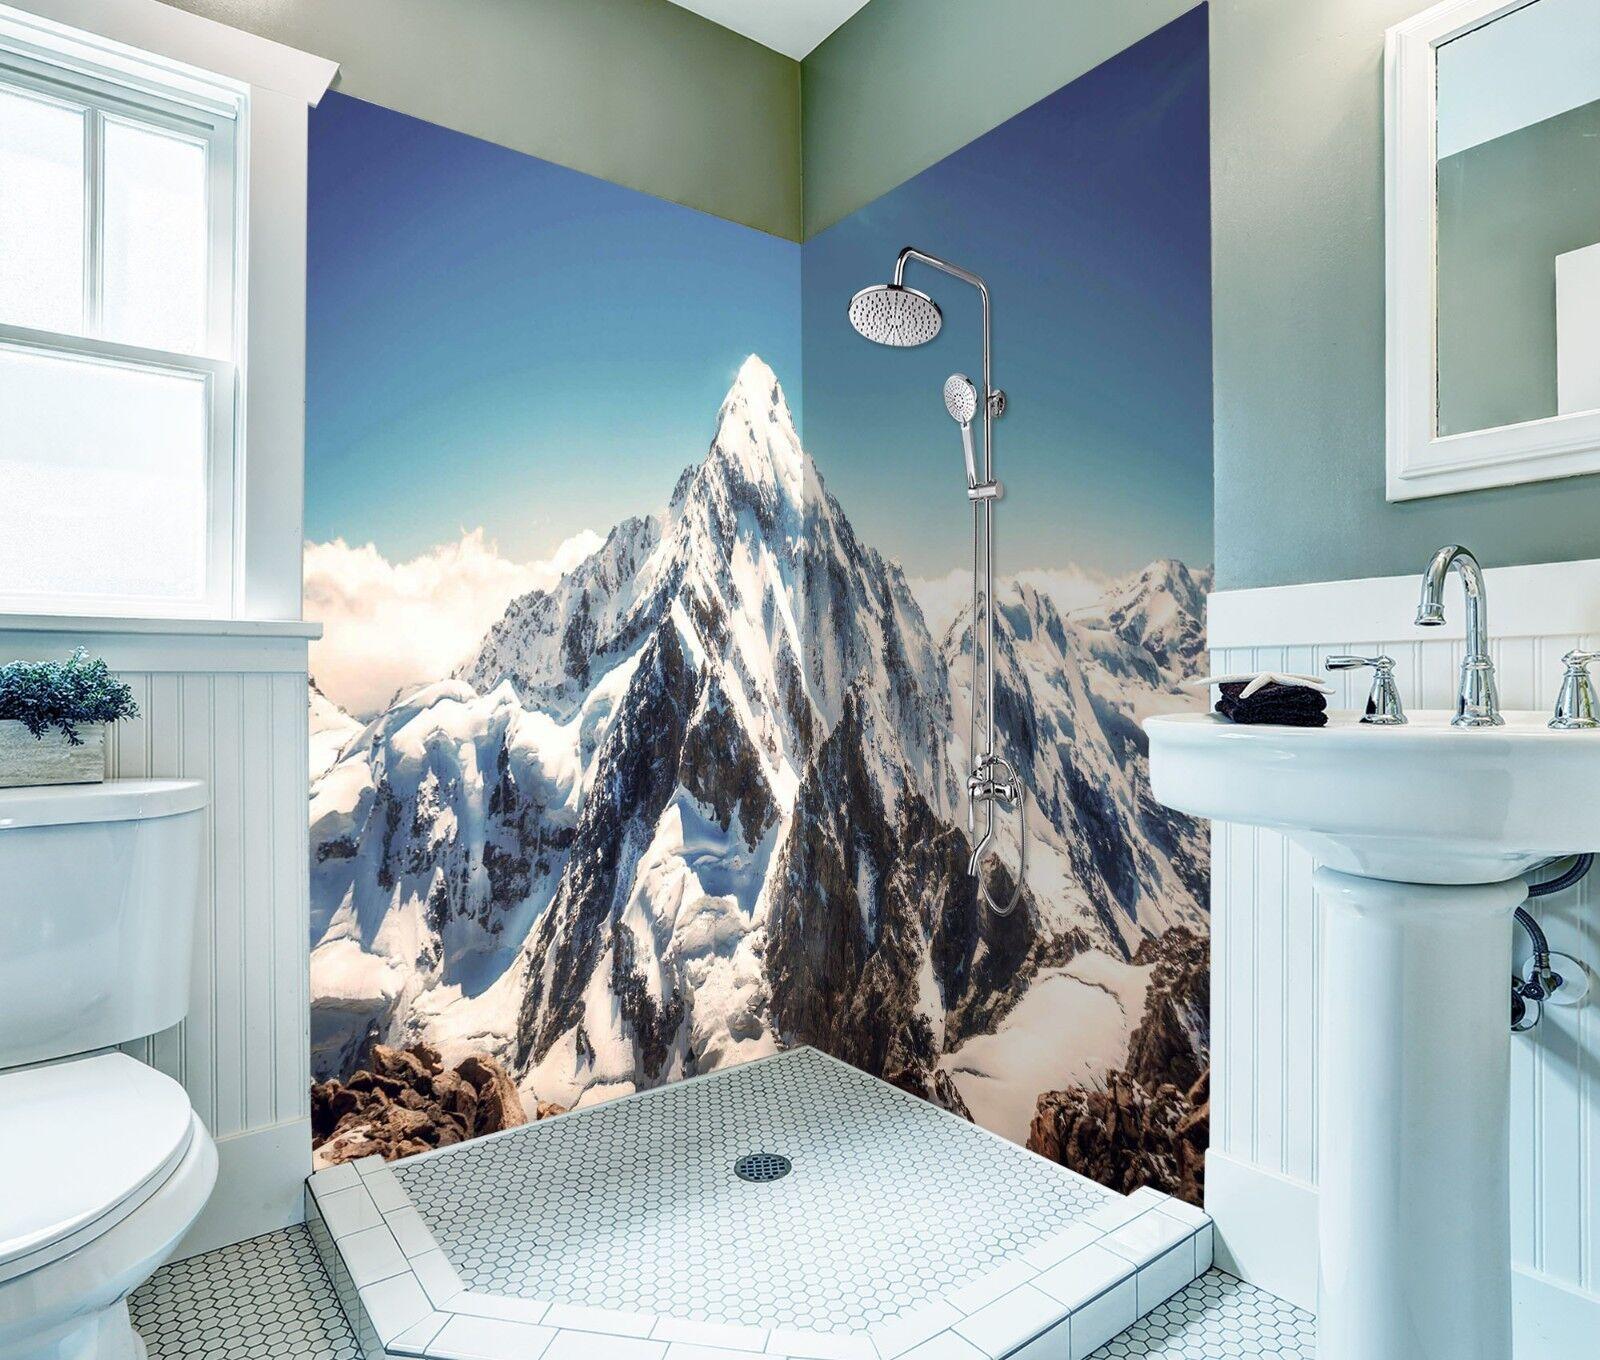 3D Mountain snow 6437 WallPaper Bathroom Print Decal Wall Deco AJ WALLPAPER UK